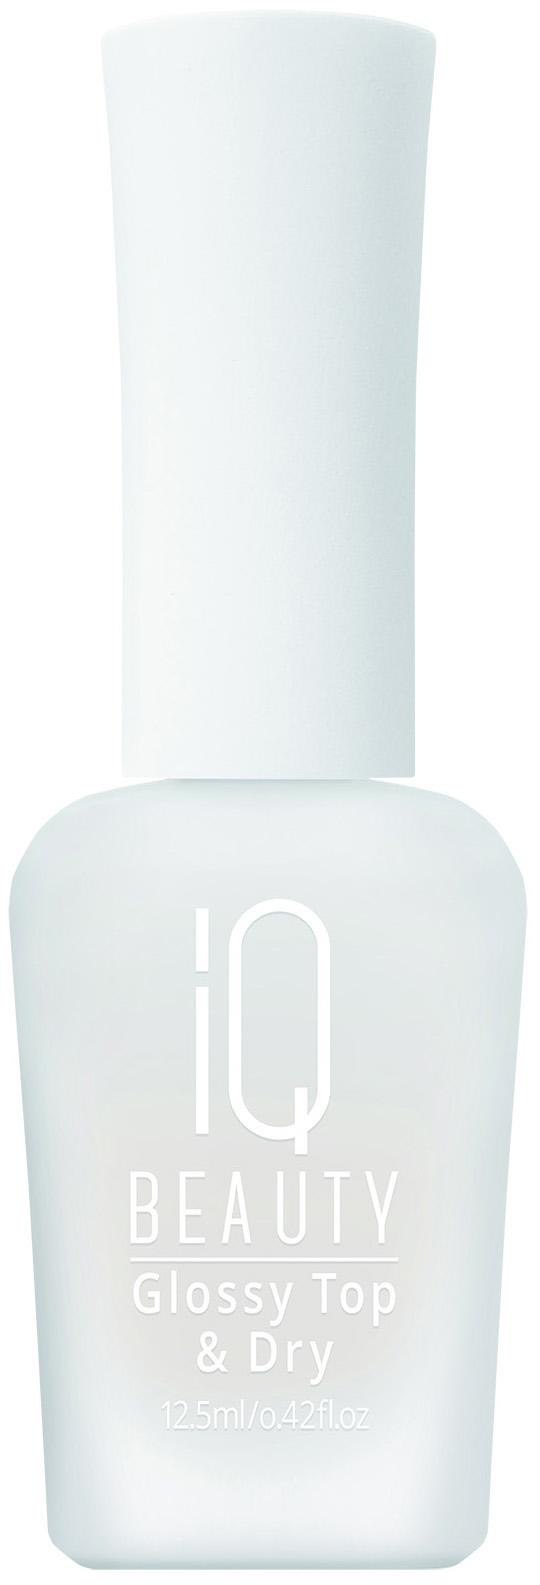 Закрепитель лака для ногтей IQ Beauty Glossy